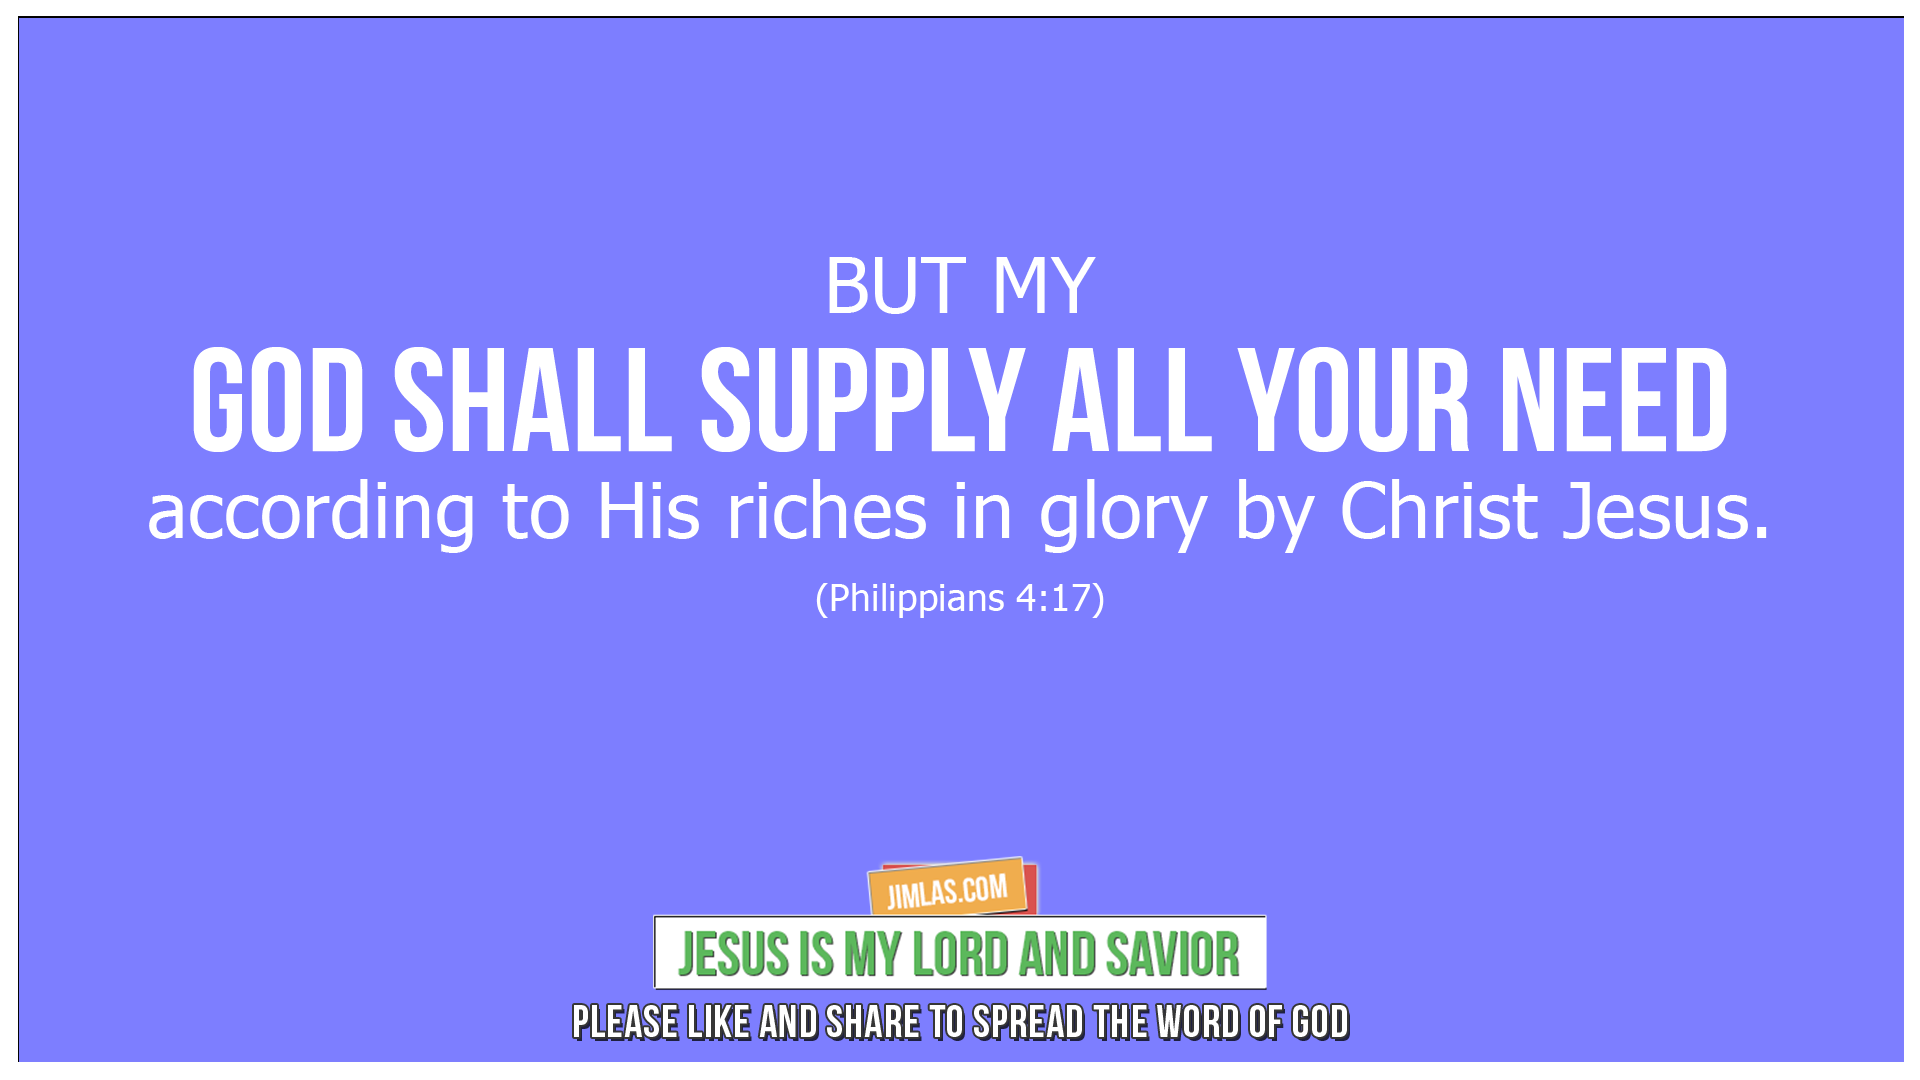 philippians 4 17, Philippians 4:17